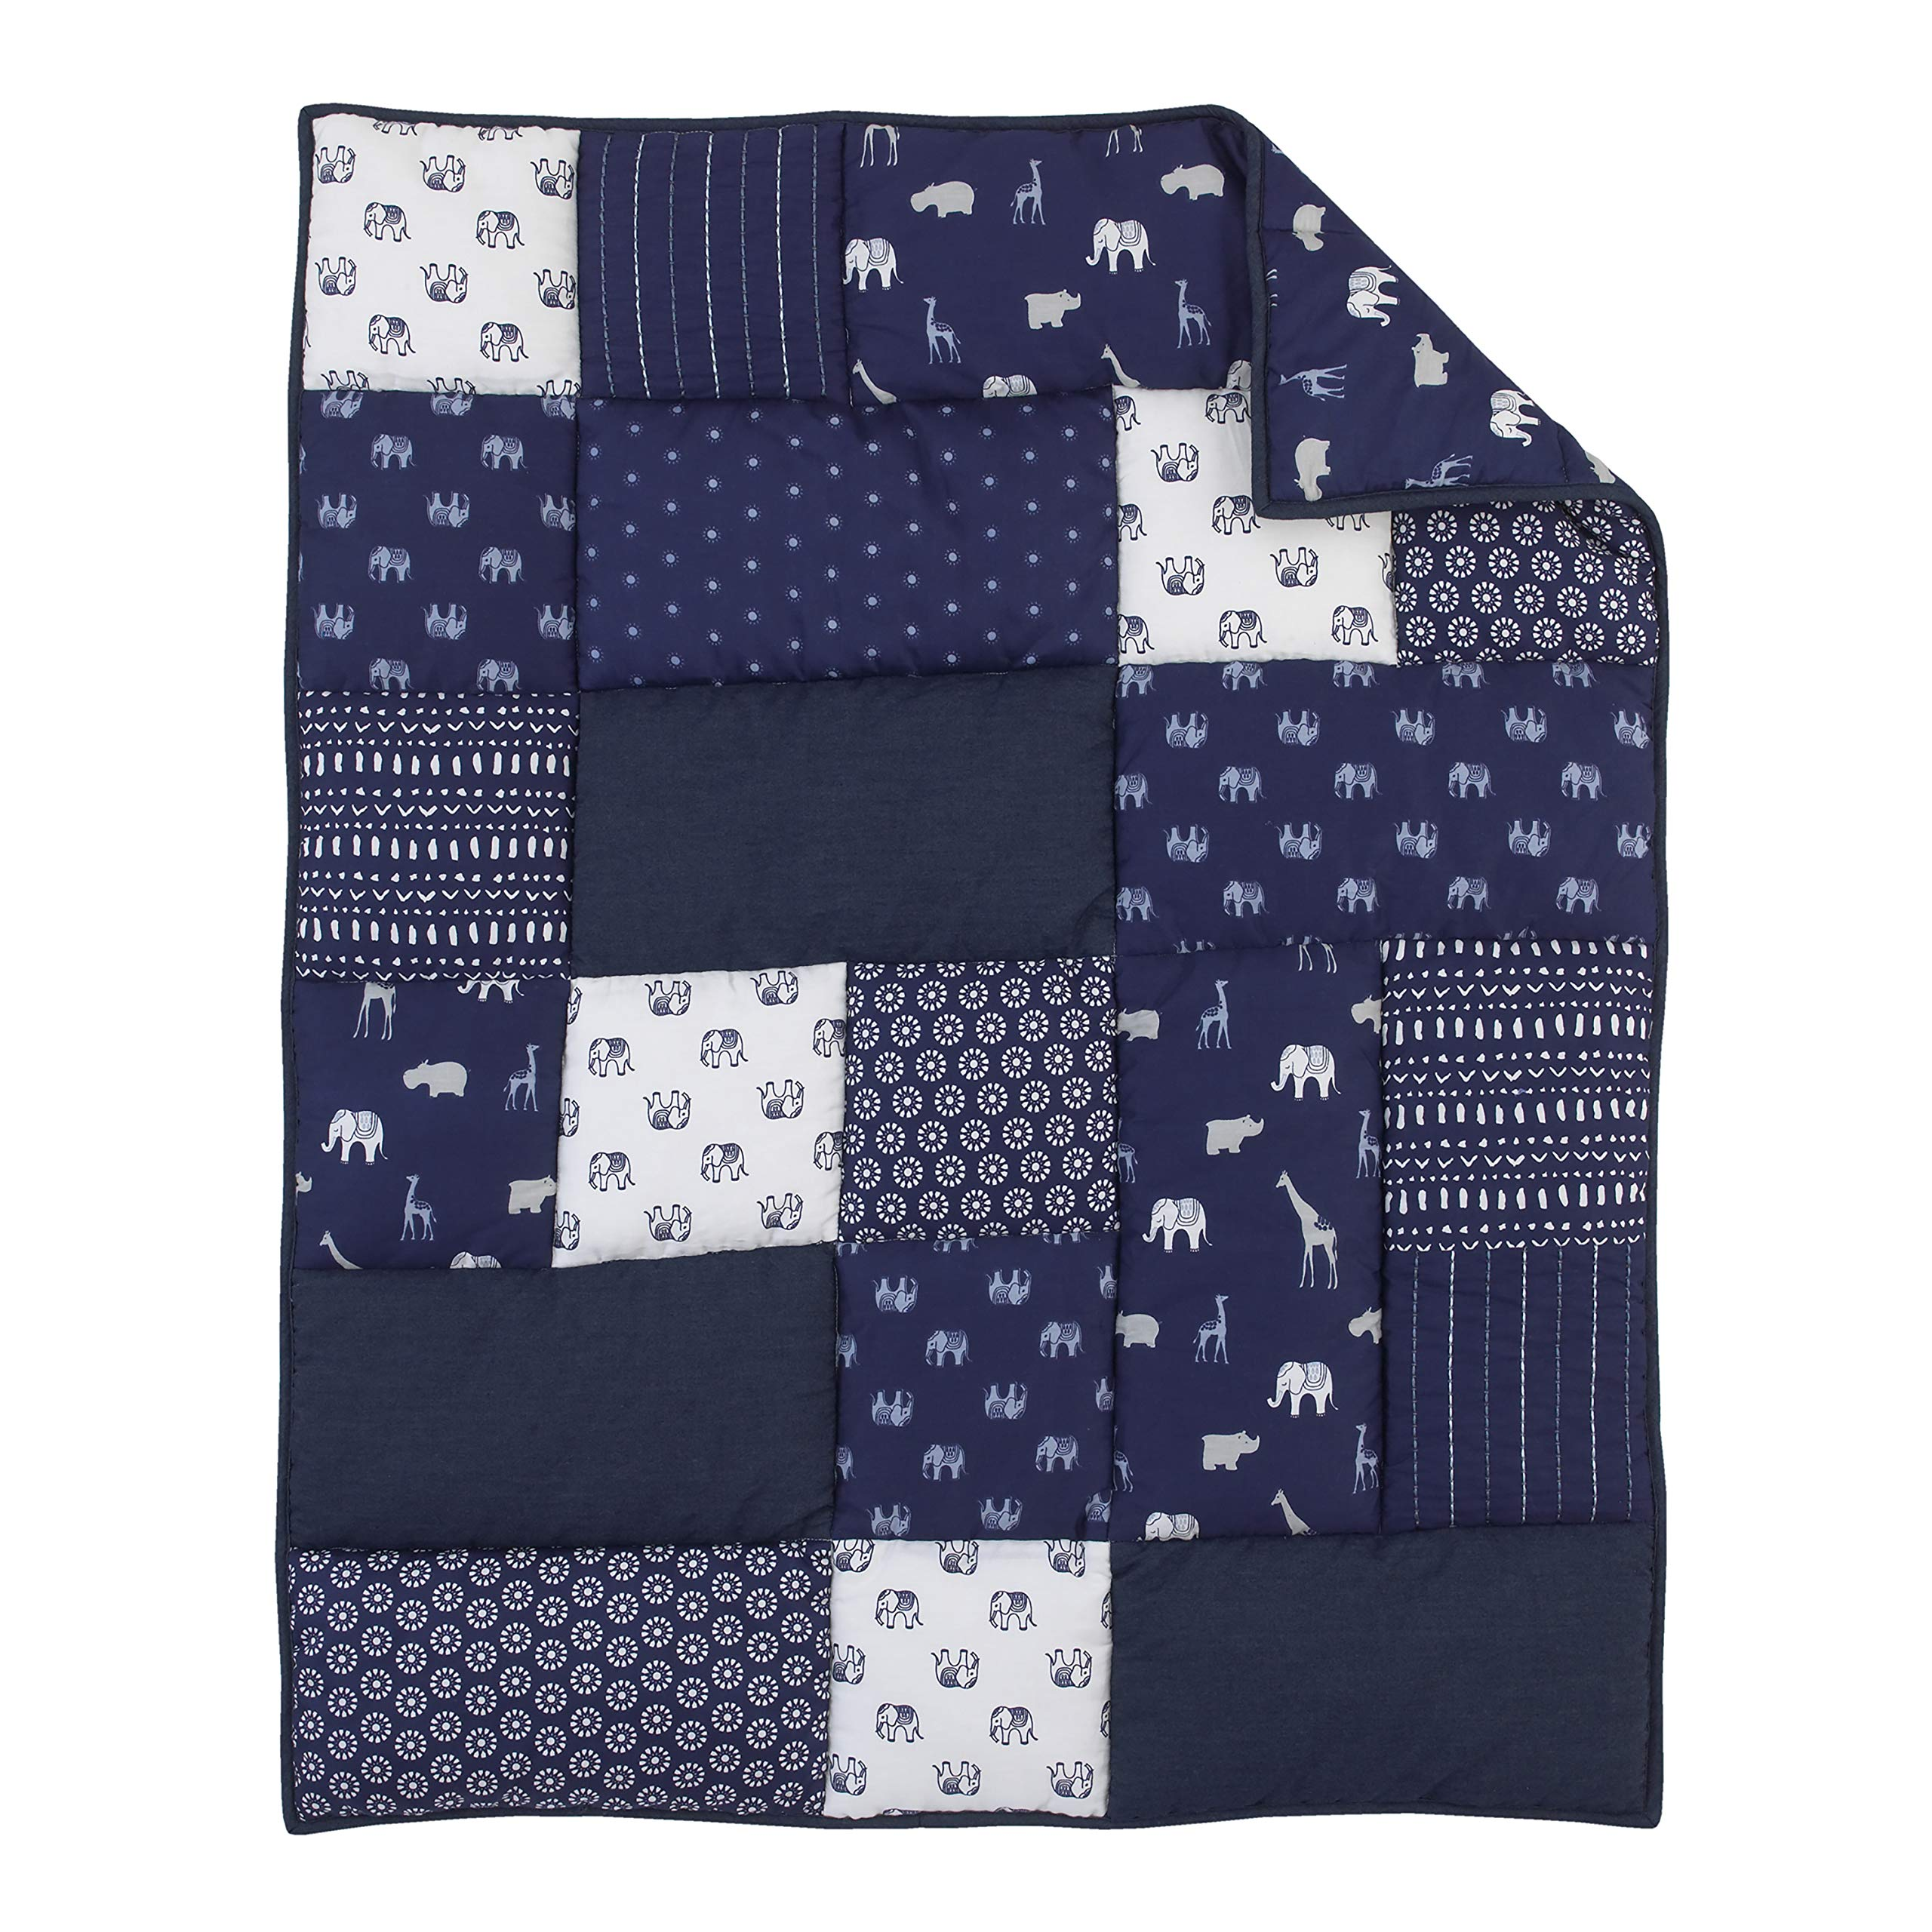 NoJo Serendipity - Indigo Animal 100% Cotton Comforter, Navy, Light Blue, Grey, Ivory by NoJo